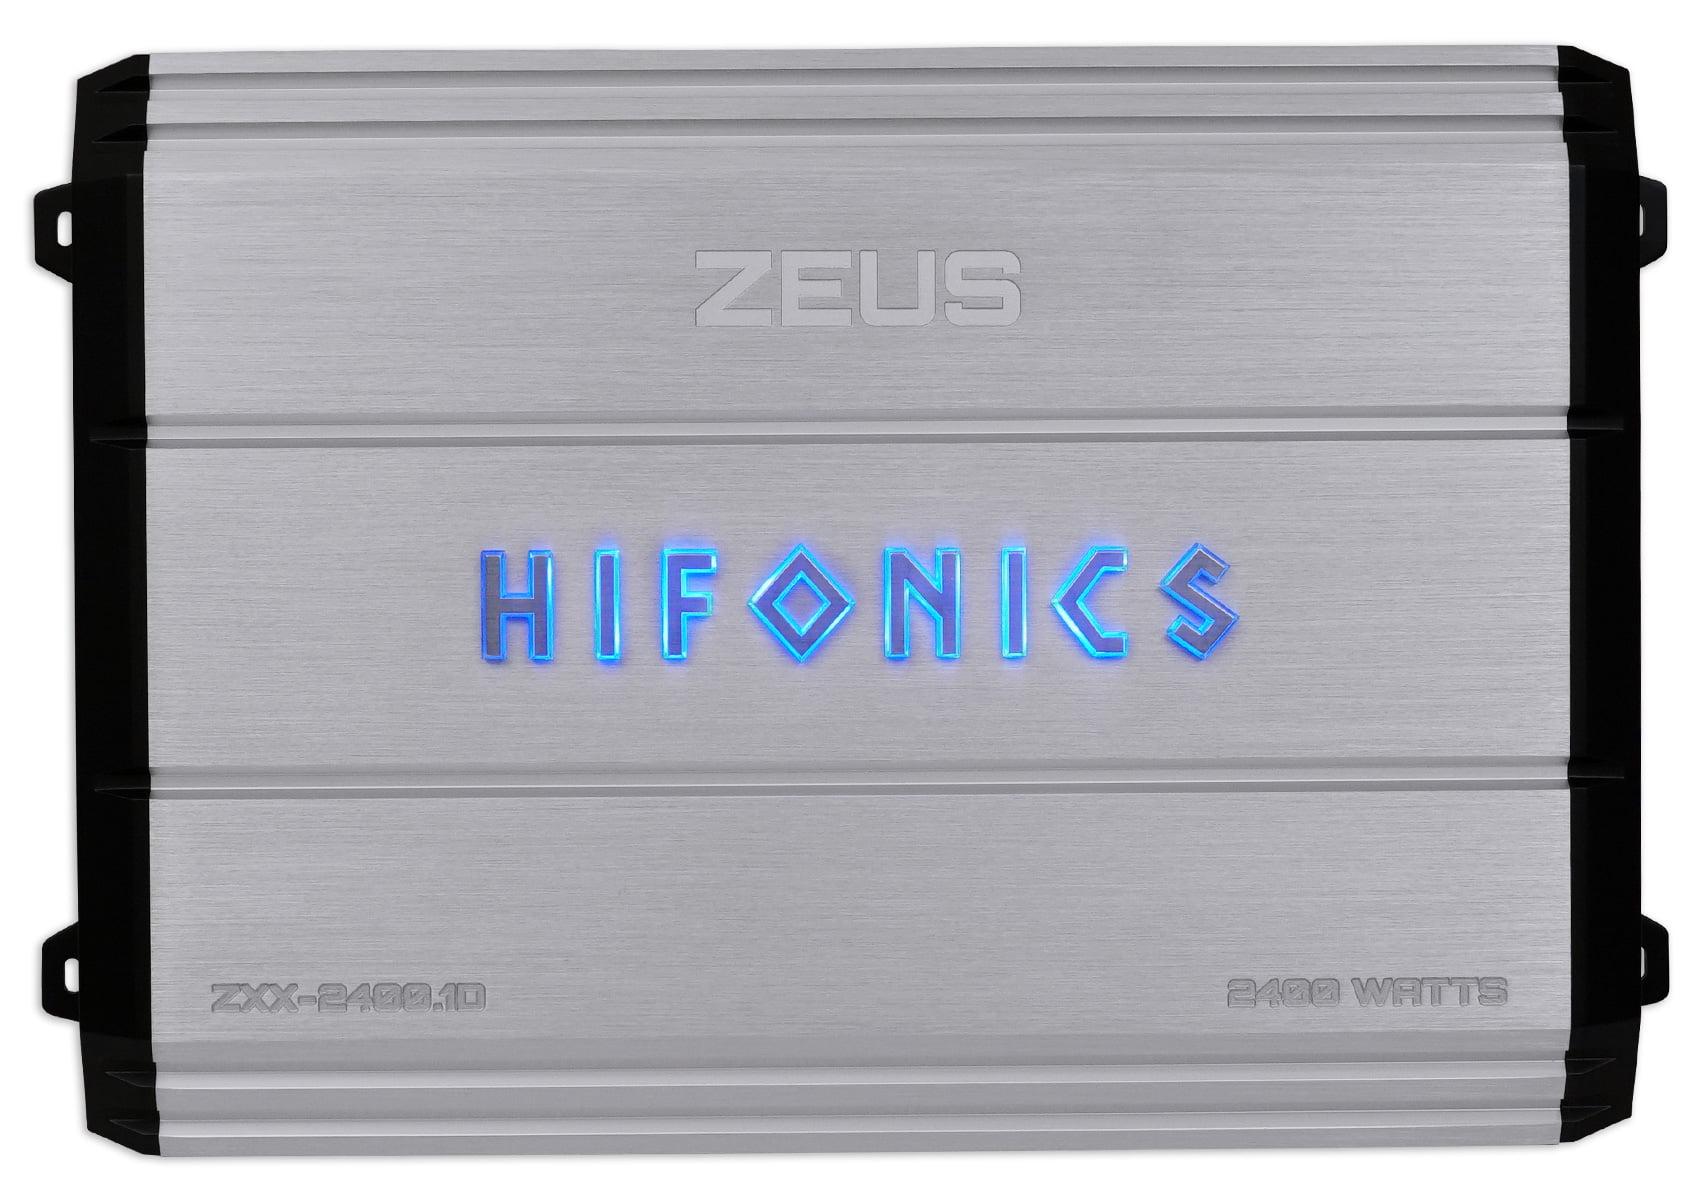 Hifonics Zeus Zxx 24001d 2400 Watt Rms Mono Car Amplifier Bass Amp Wiring Diagram Remote Kit